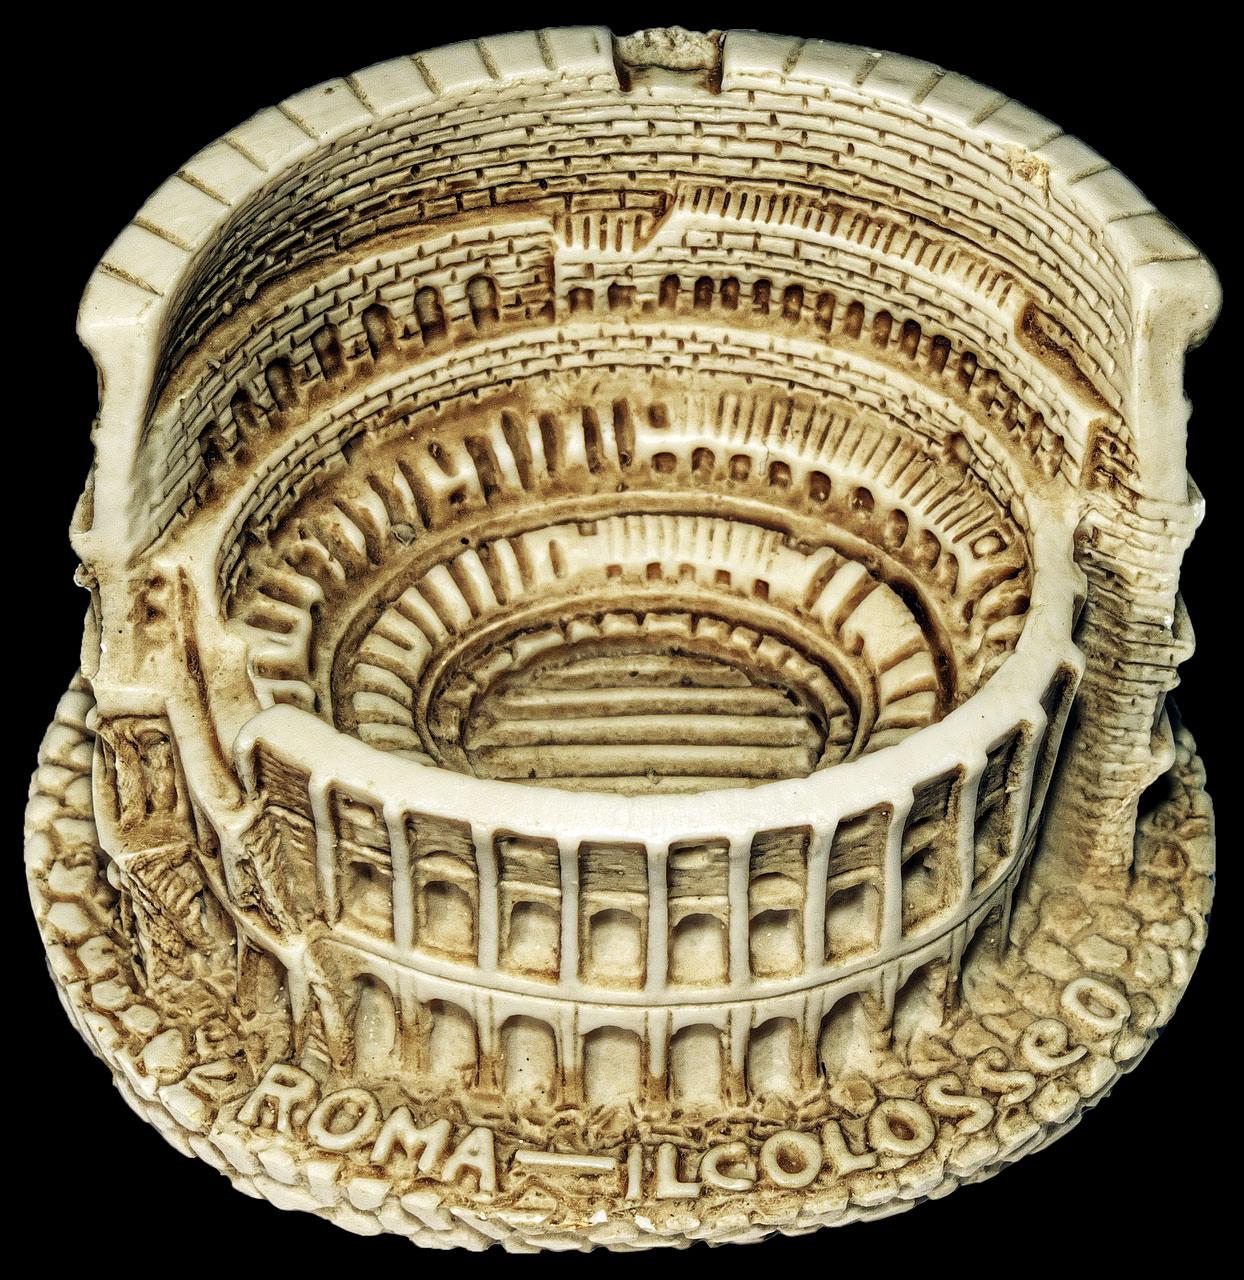 colosseo souvenir roma italia